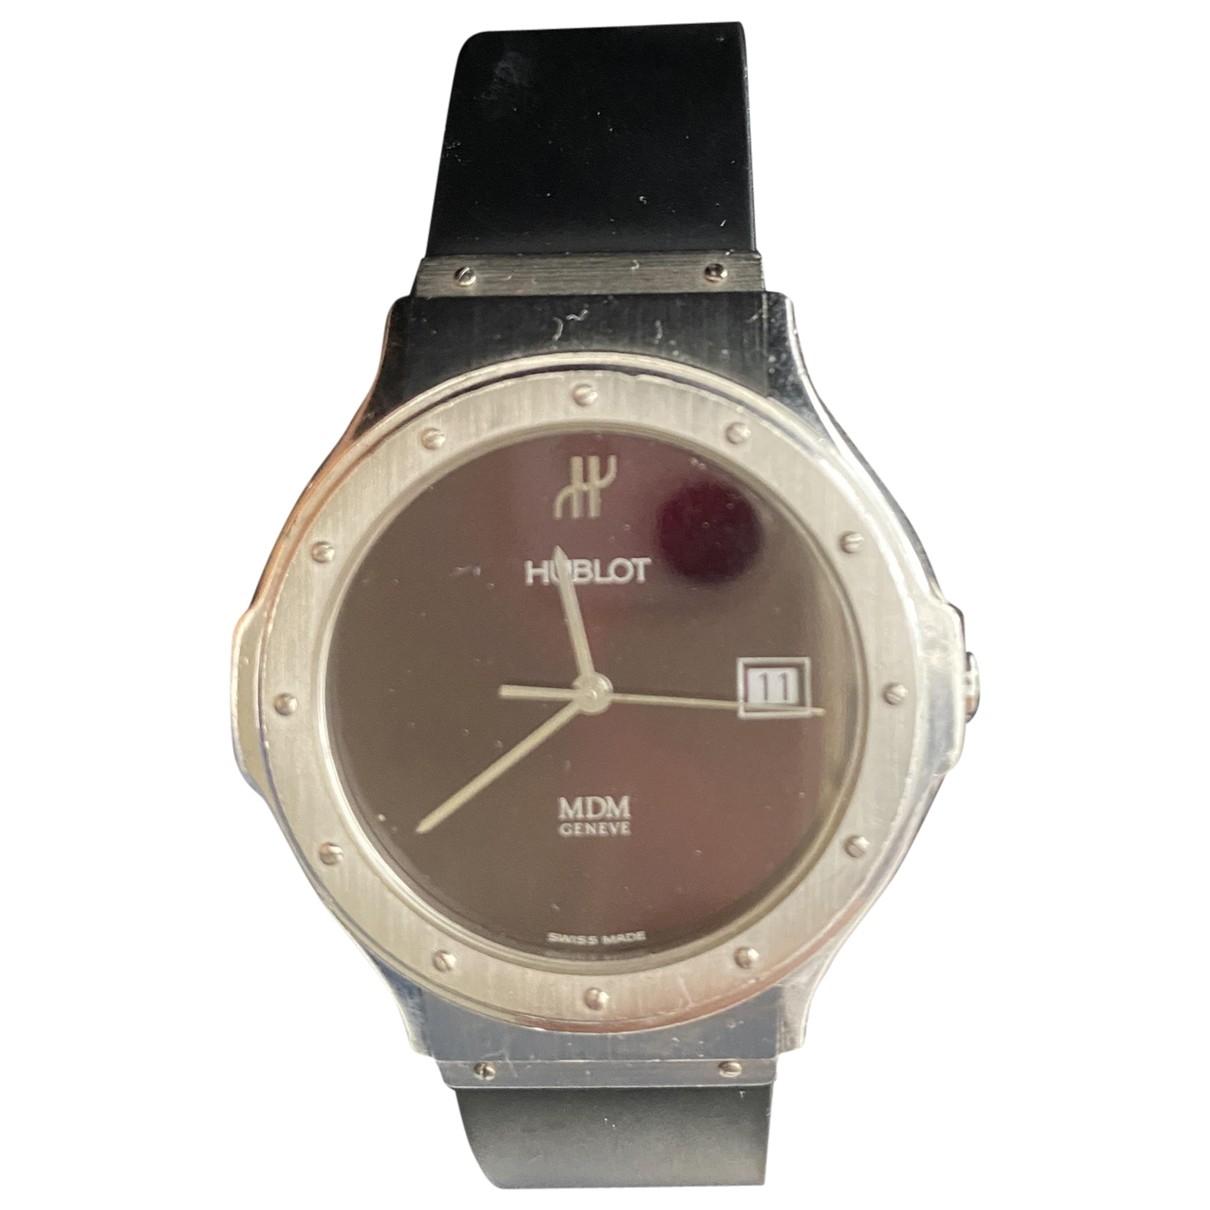 Hublot MDM Uhr in  Silber Stahl